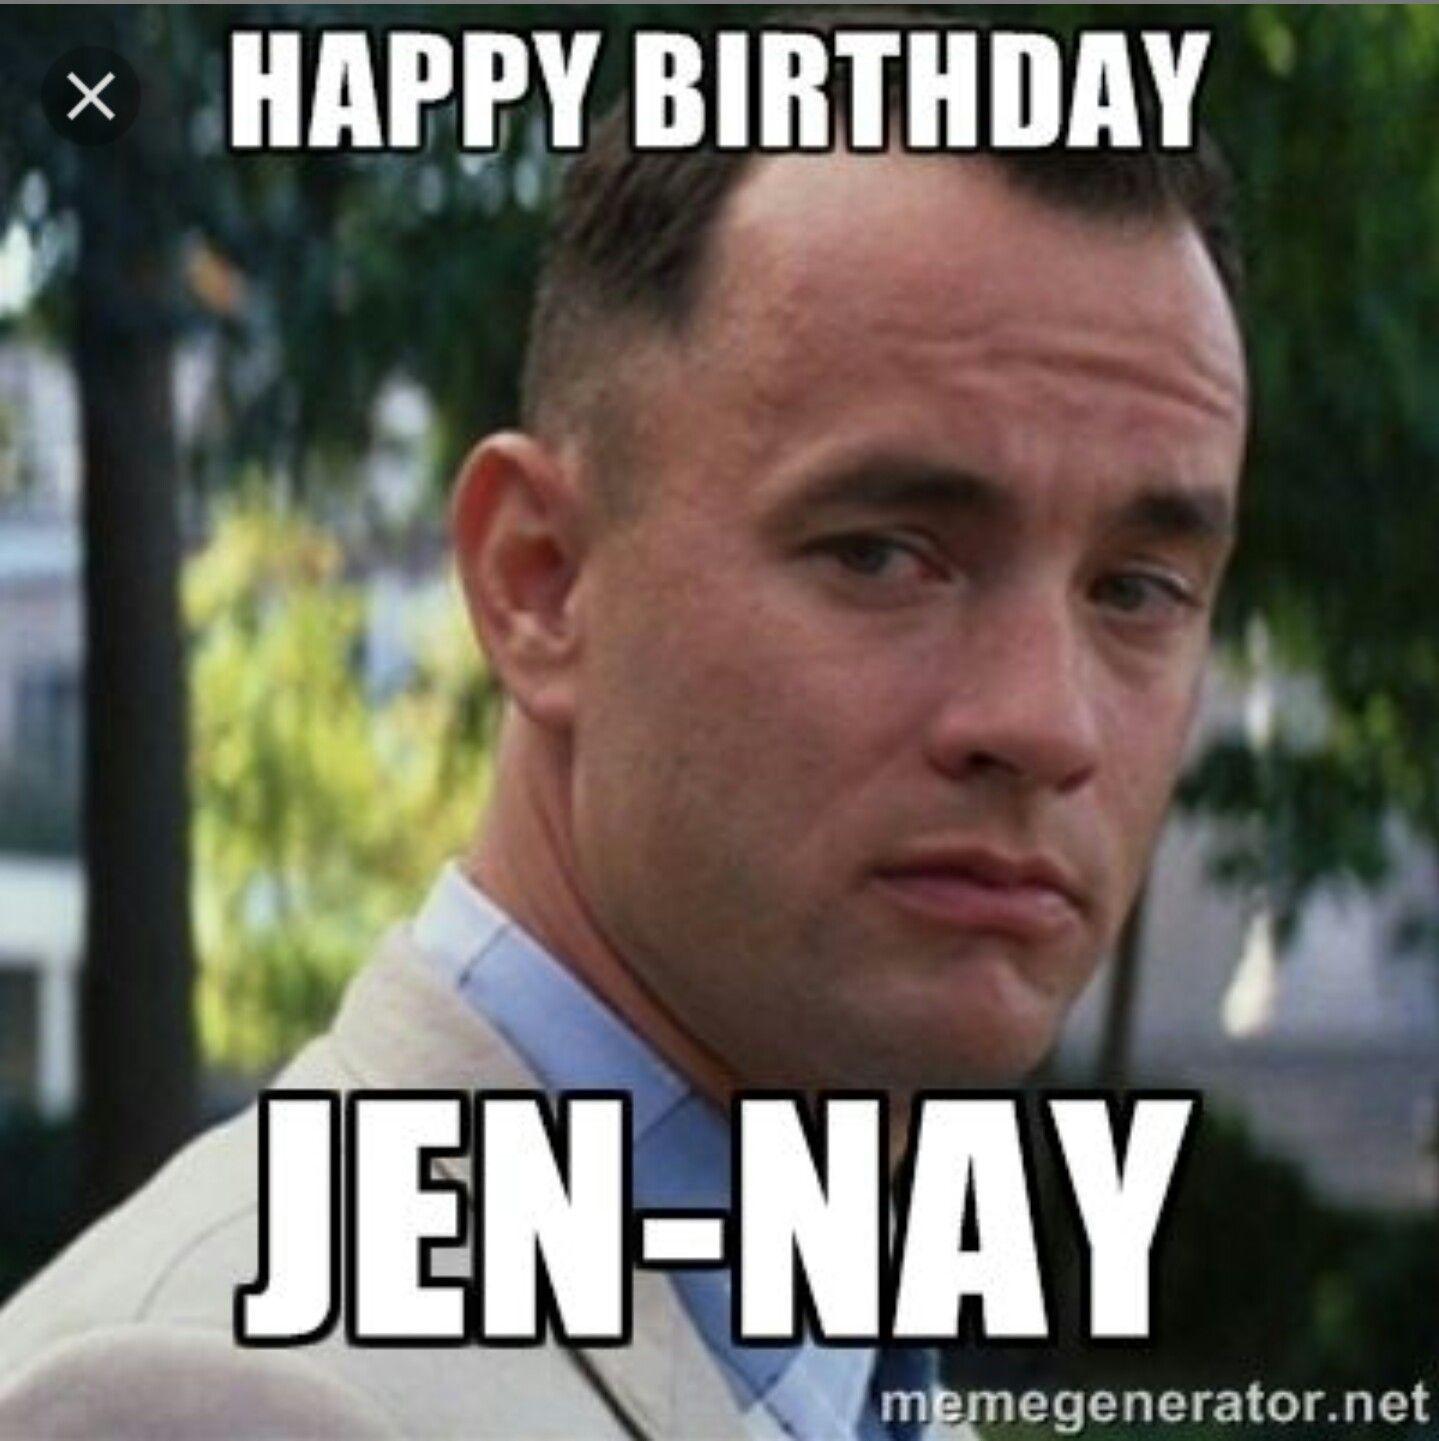 Memes Vault Happy Birthday Meme with the Funny Man